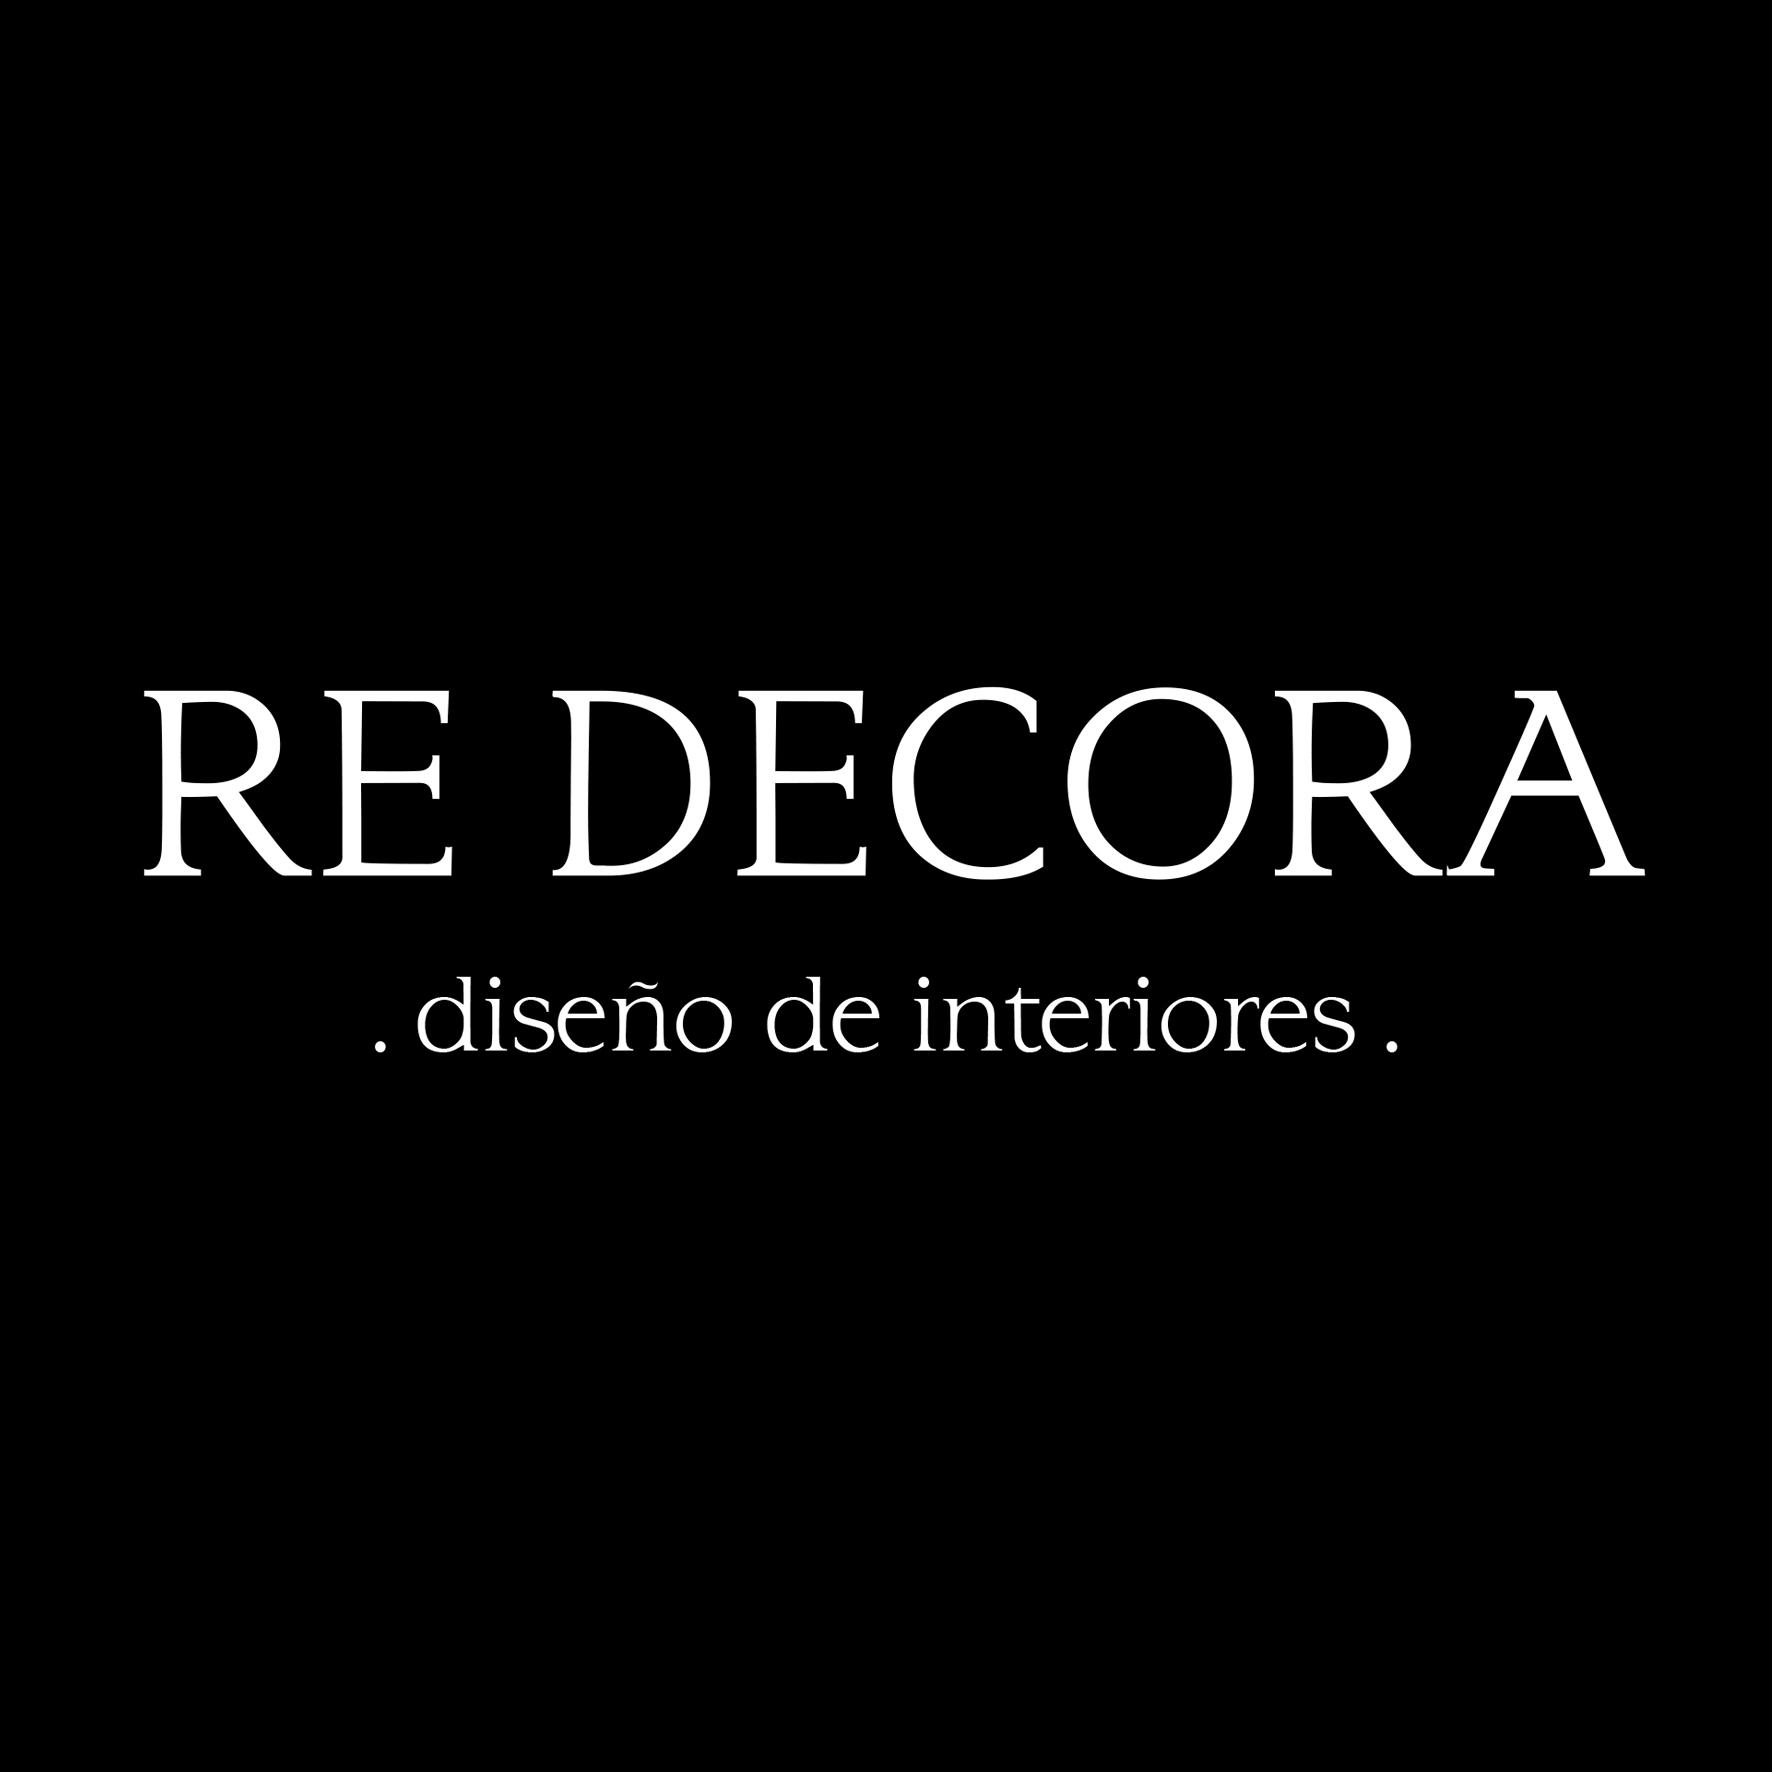 Re Decora